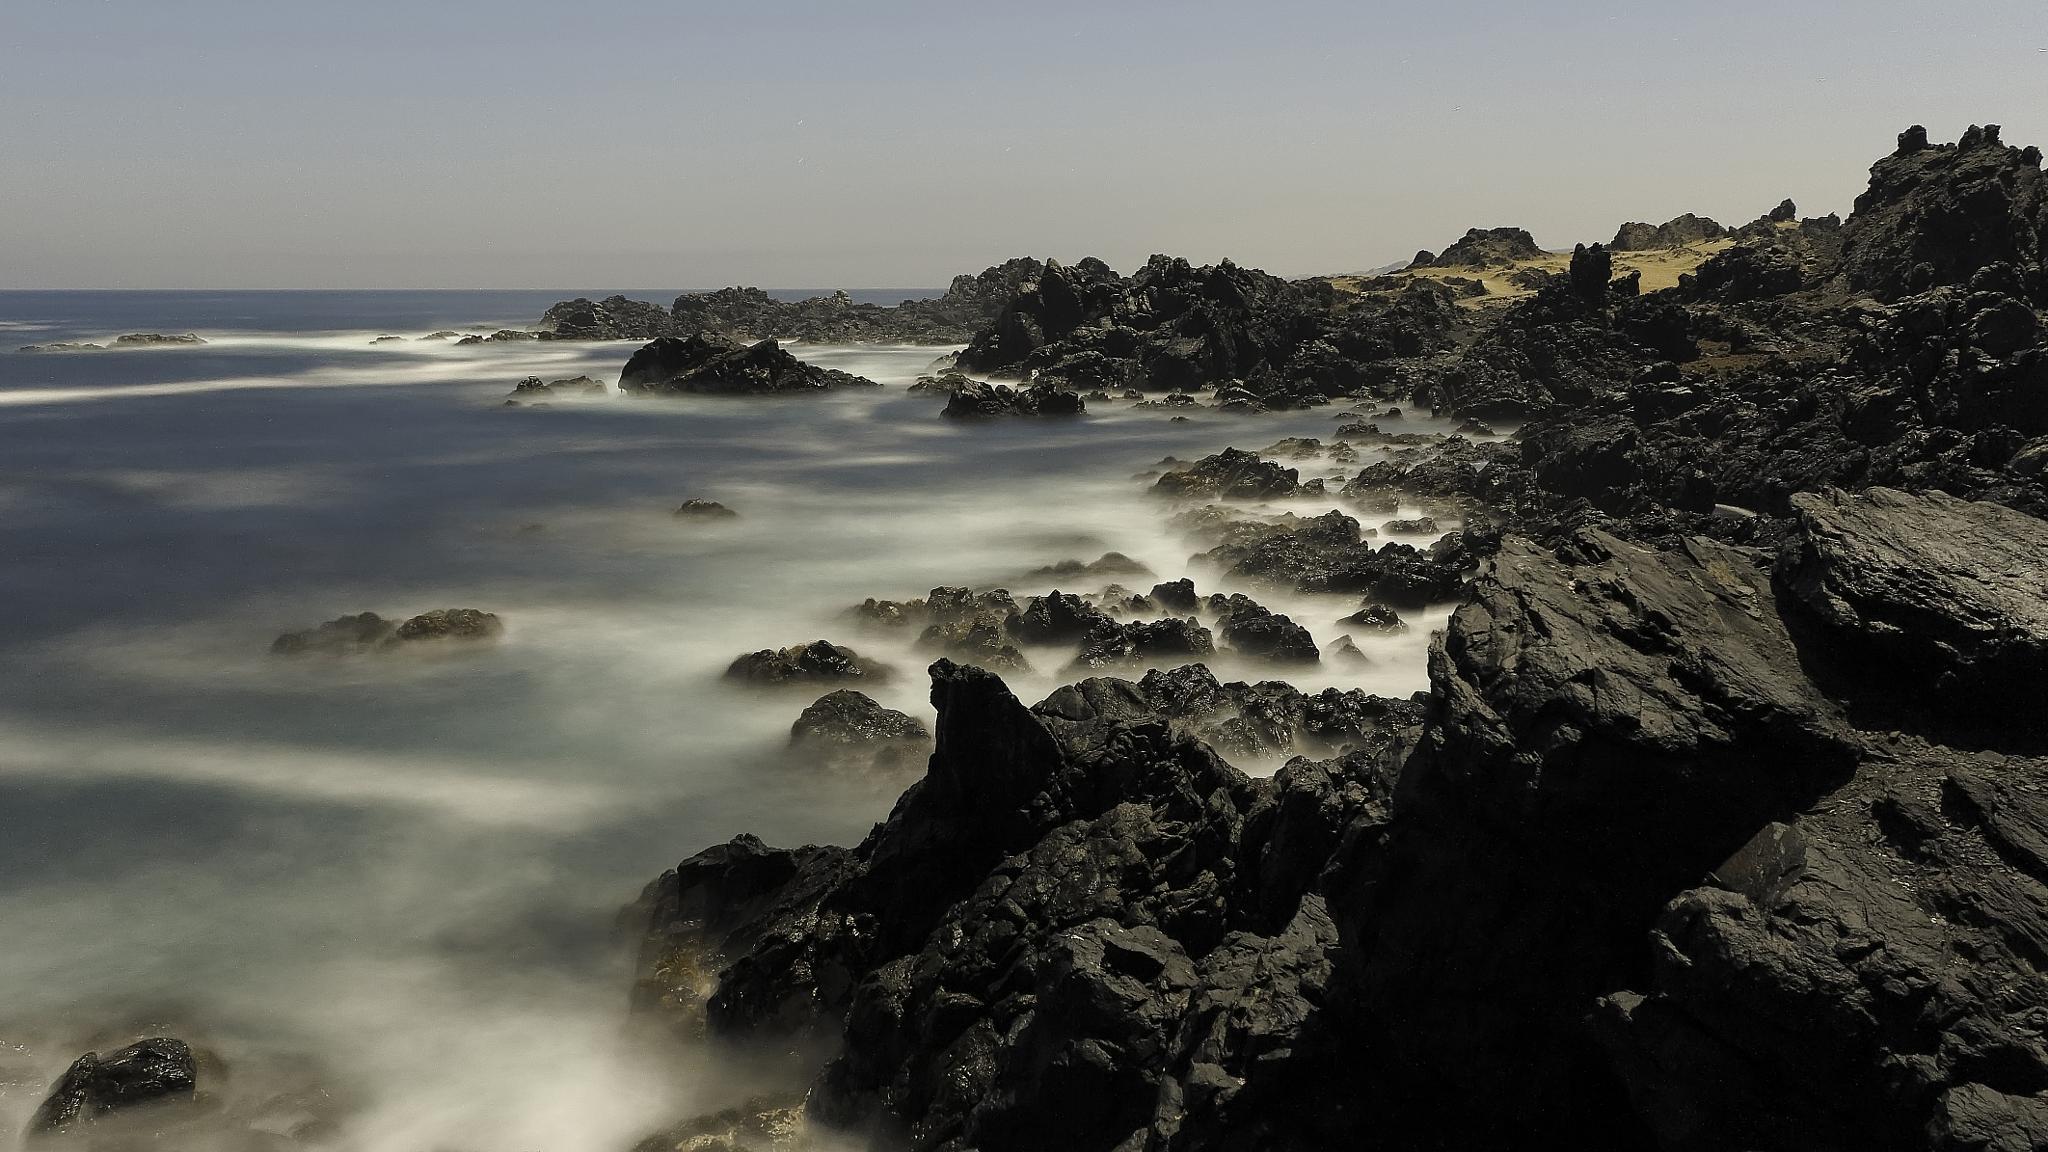 The Atacama coastal border by cristian.negrus